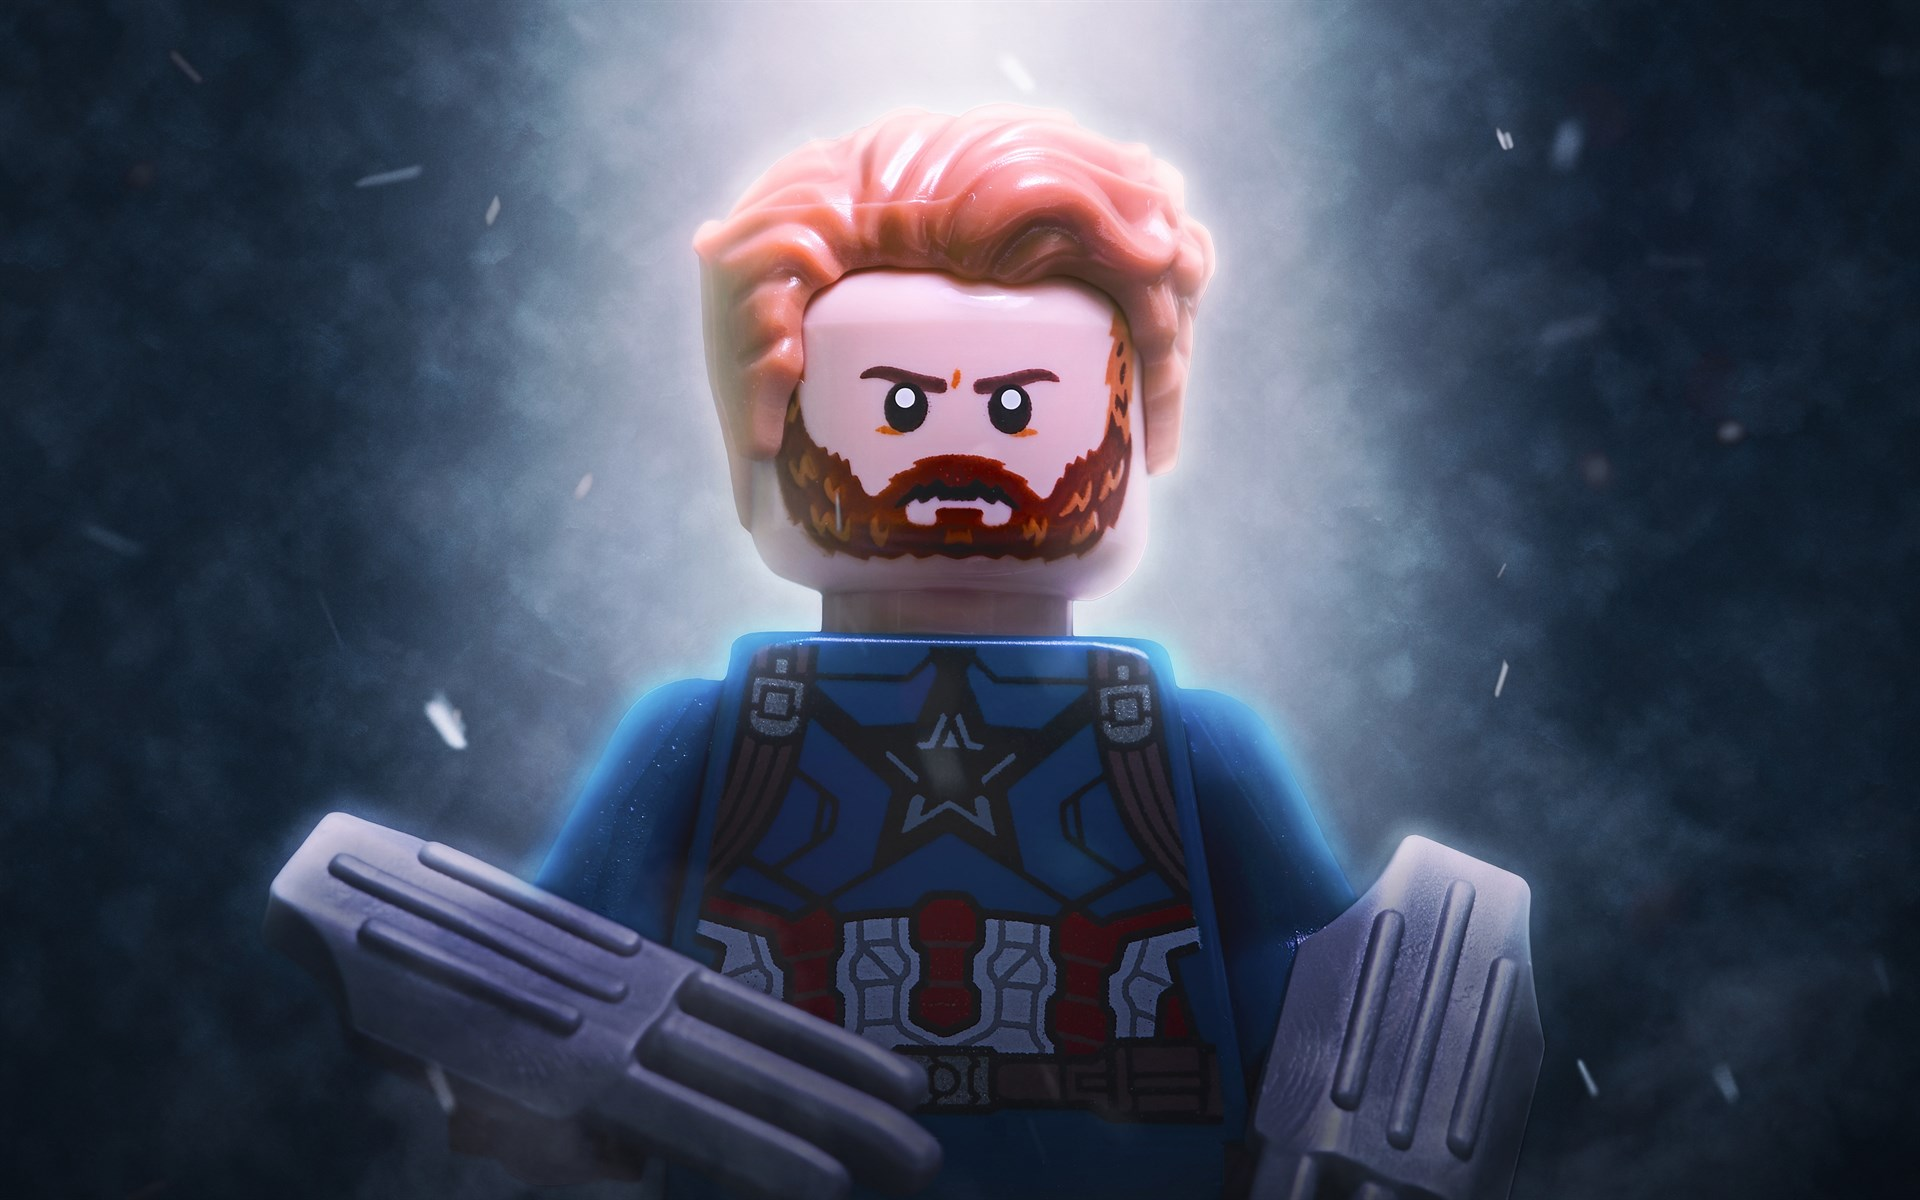 download wallpaper: LEGO Captain America wallpaper